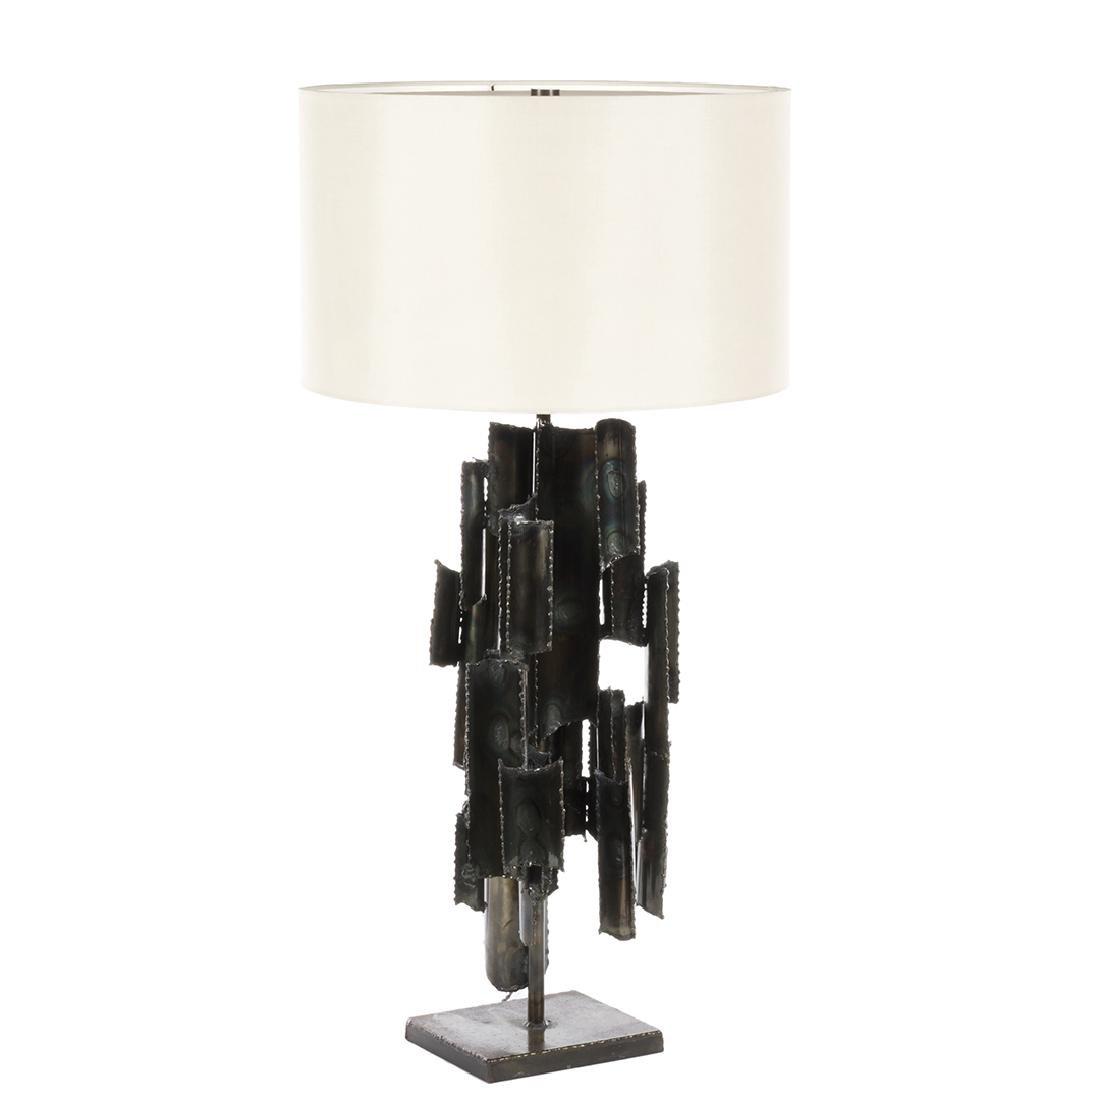 Marcello Fantoni Studio Burnished Metal Table Lamp